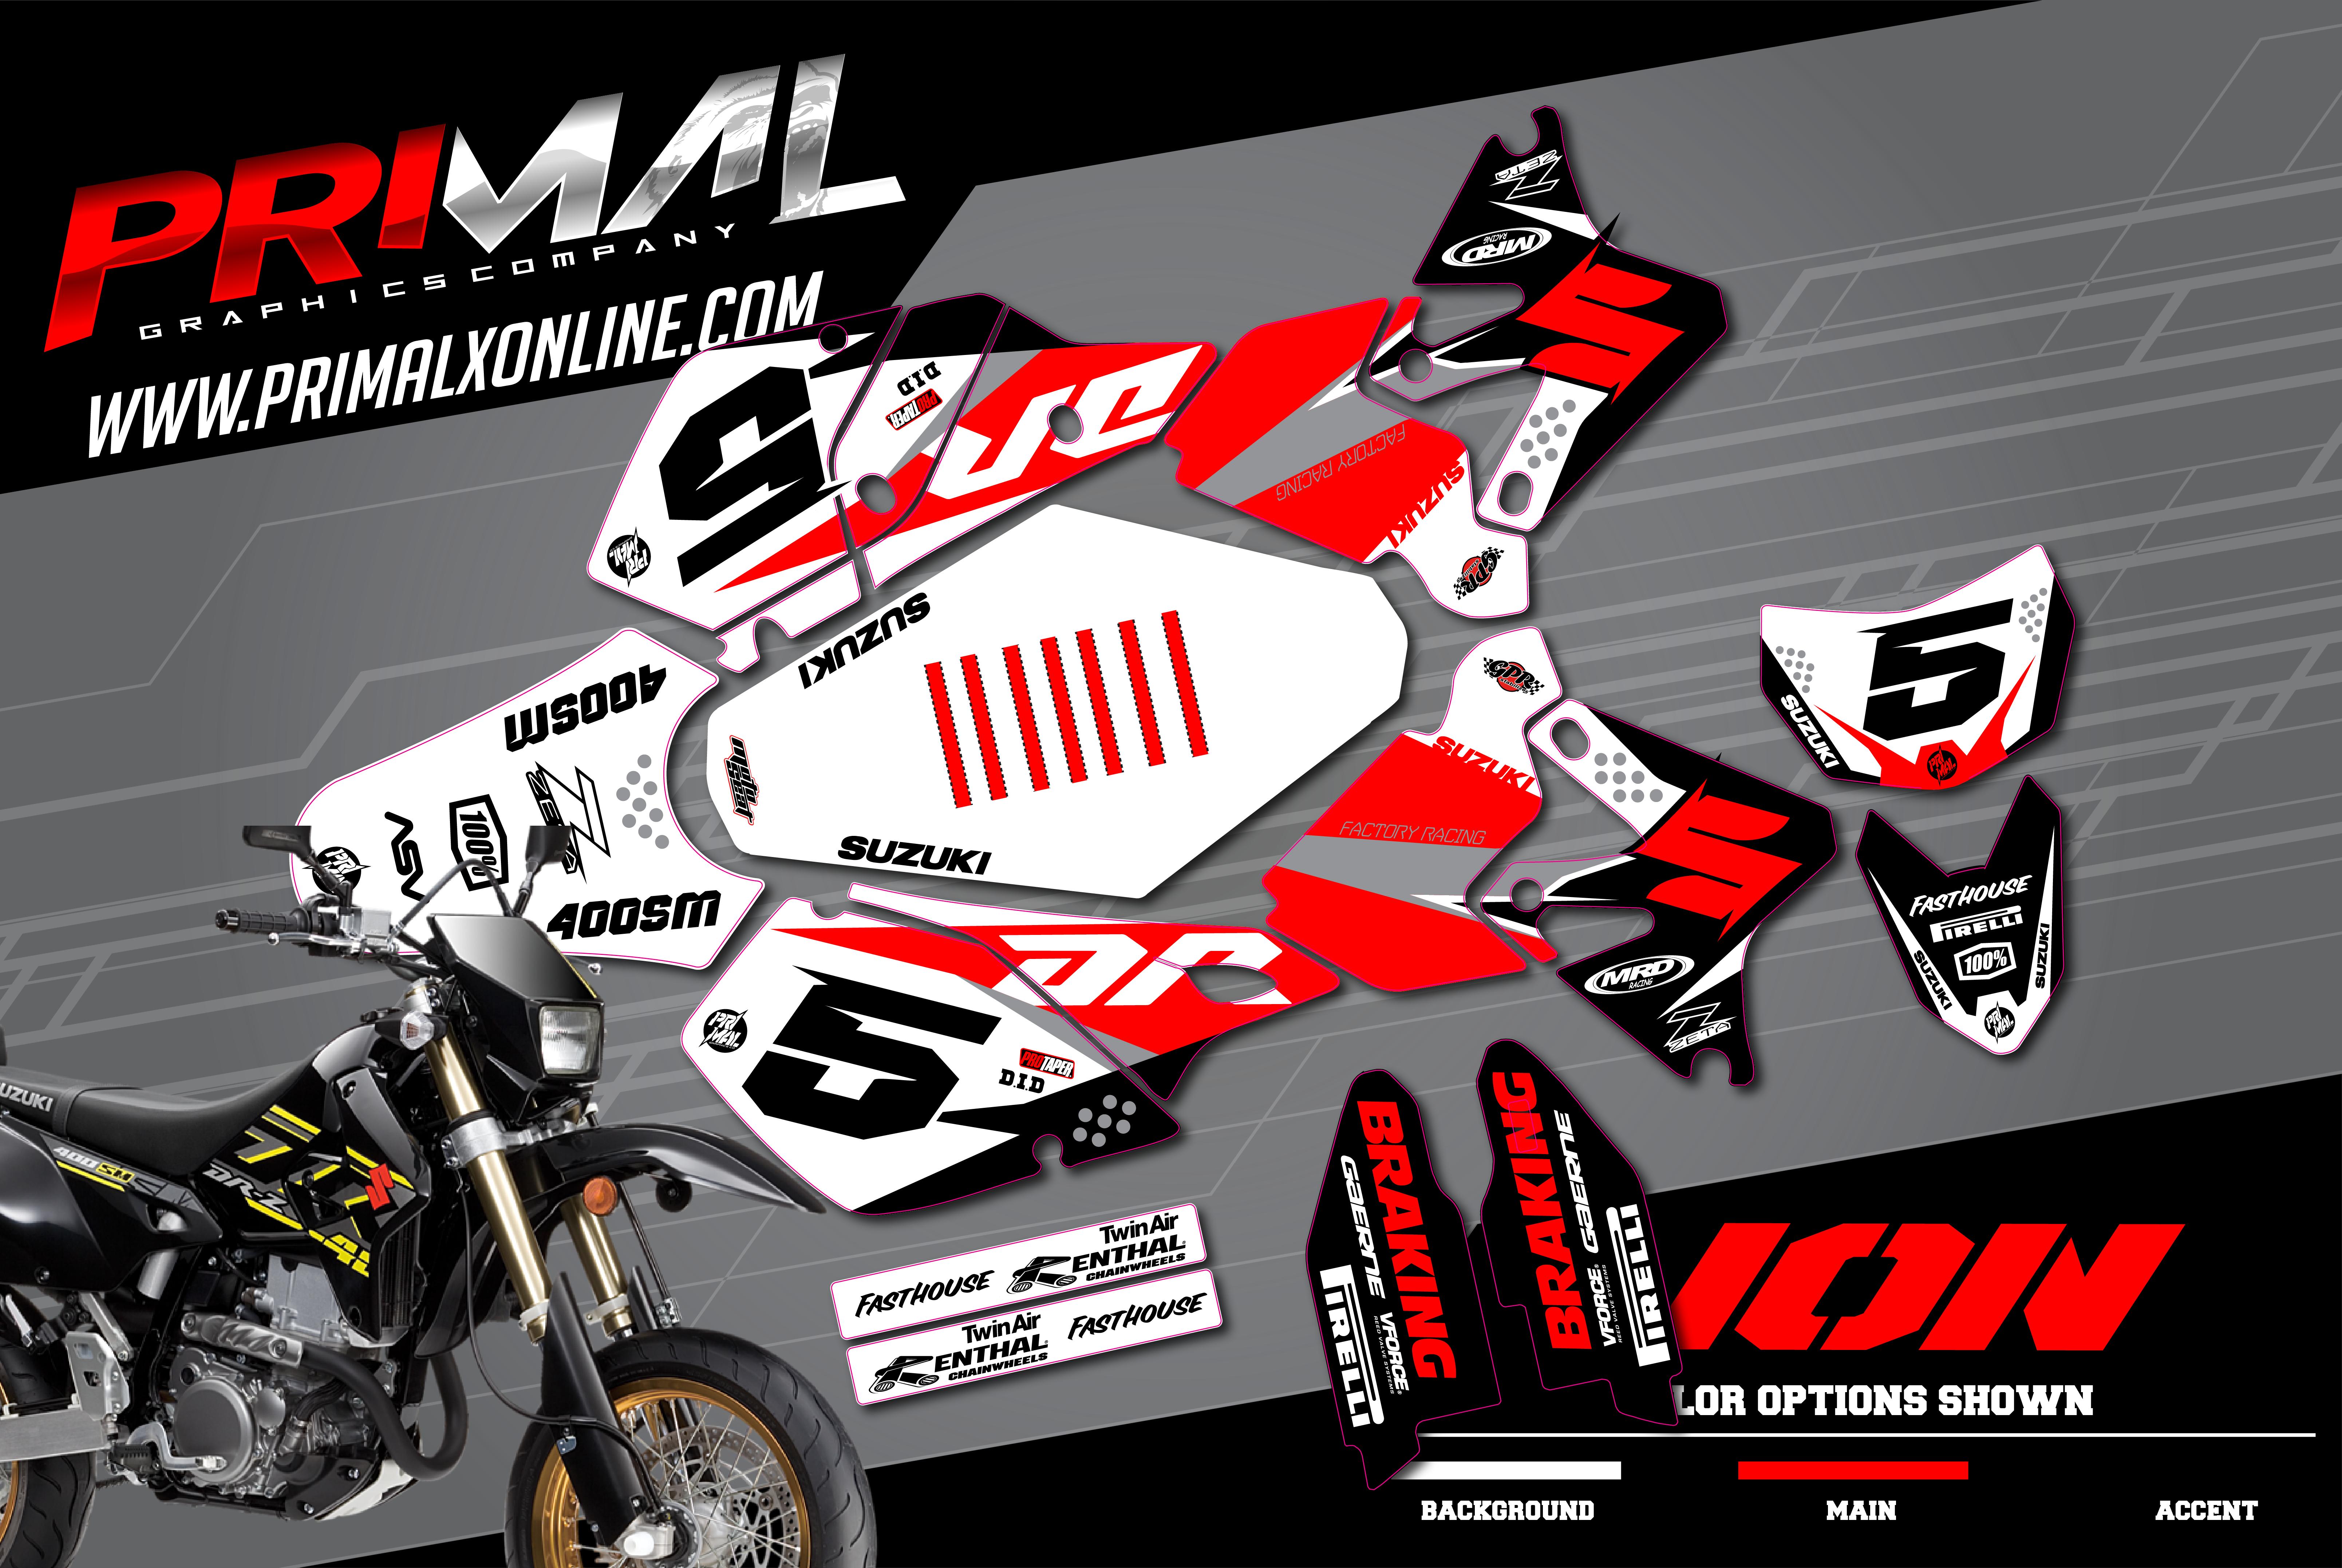 PRIMAL-X-MOTORSPORTS-PRIMAL-GRAPHICS-CO-2021-SUZUKI-DRZ400SM-MOTOCROSS-GRAPHICS-ION-SERIES-01-01-01